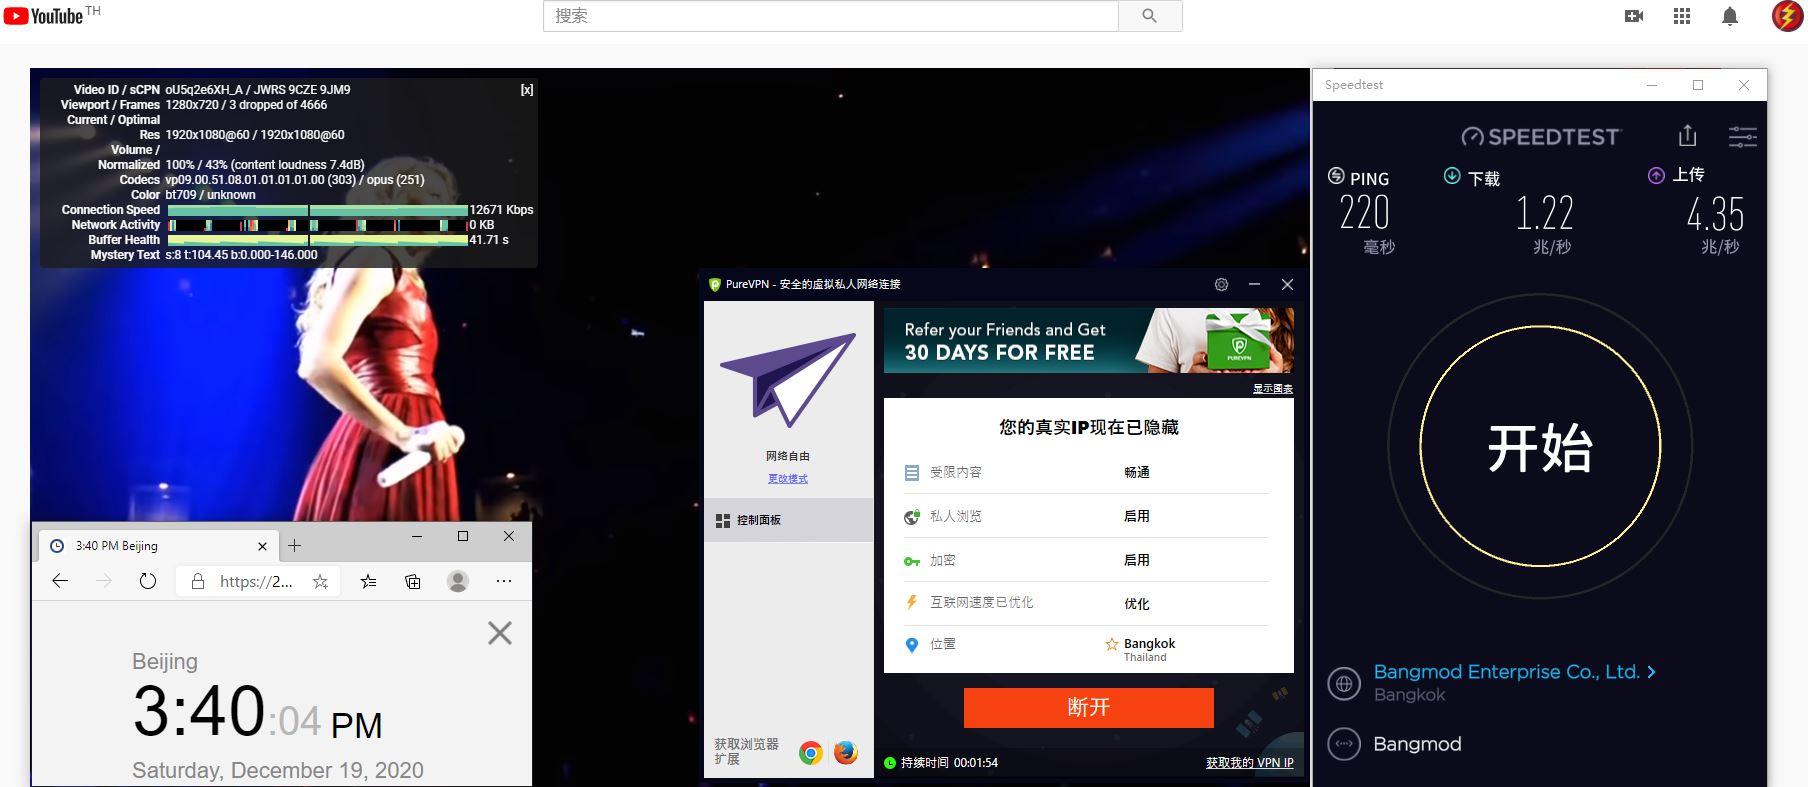 Windows10 PureVPN Thailand 服务器 中国VPN 翻墙 科学上网 测试 - 20201219